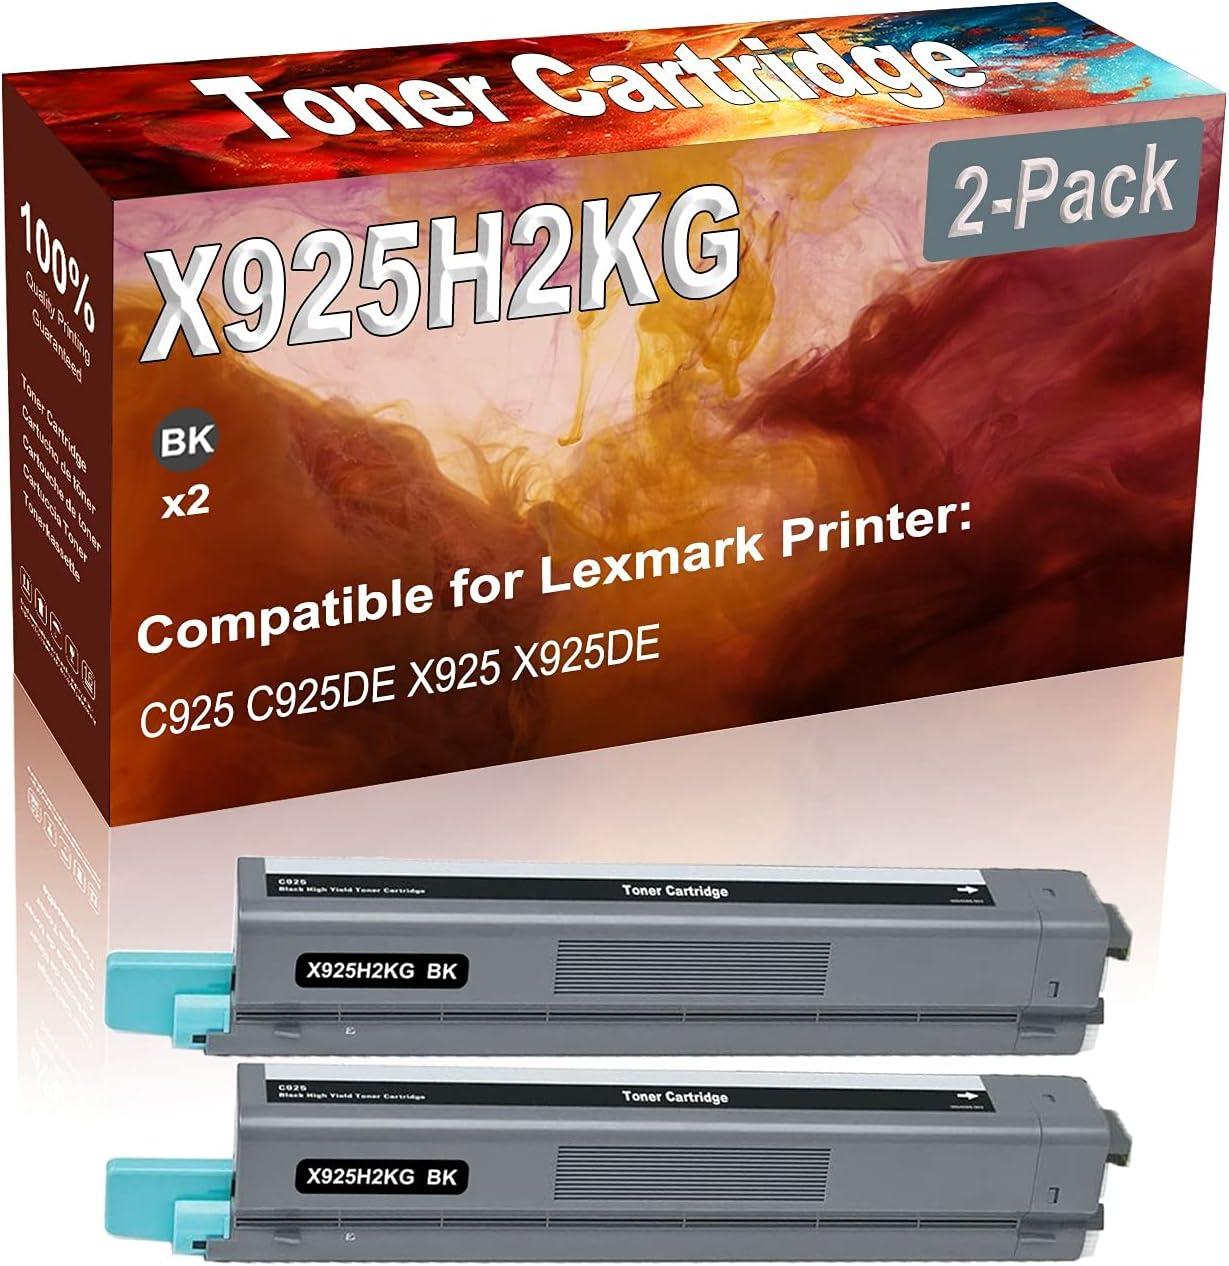 2-Pack (Black) Compatible C925 C925DE X925 X925DE Laser Printer Toner Cartridge (High Capacity) Replacement for Lexmark X925H2KG Printer Toner Cartridge